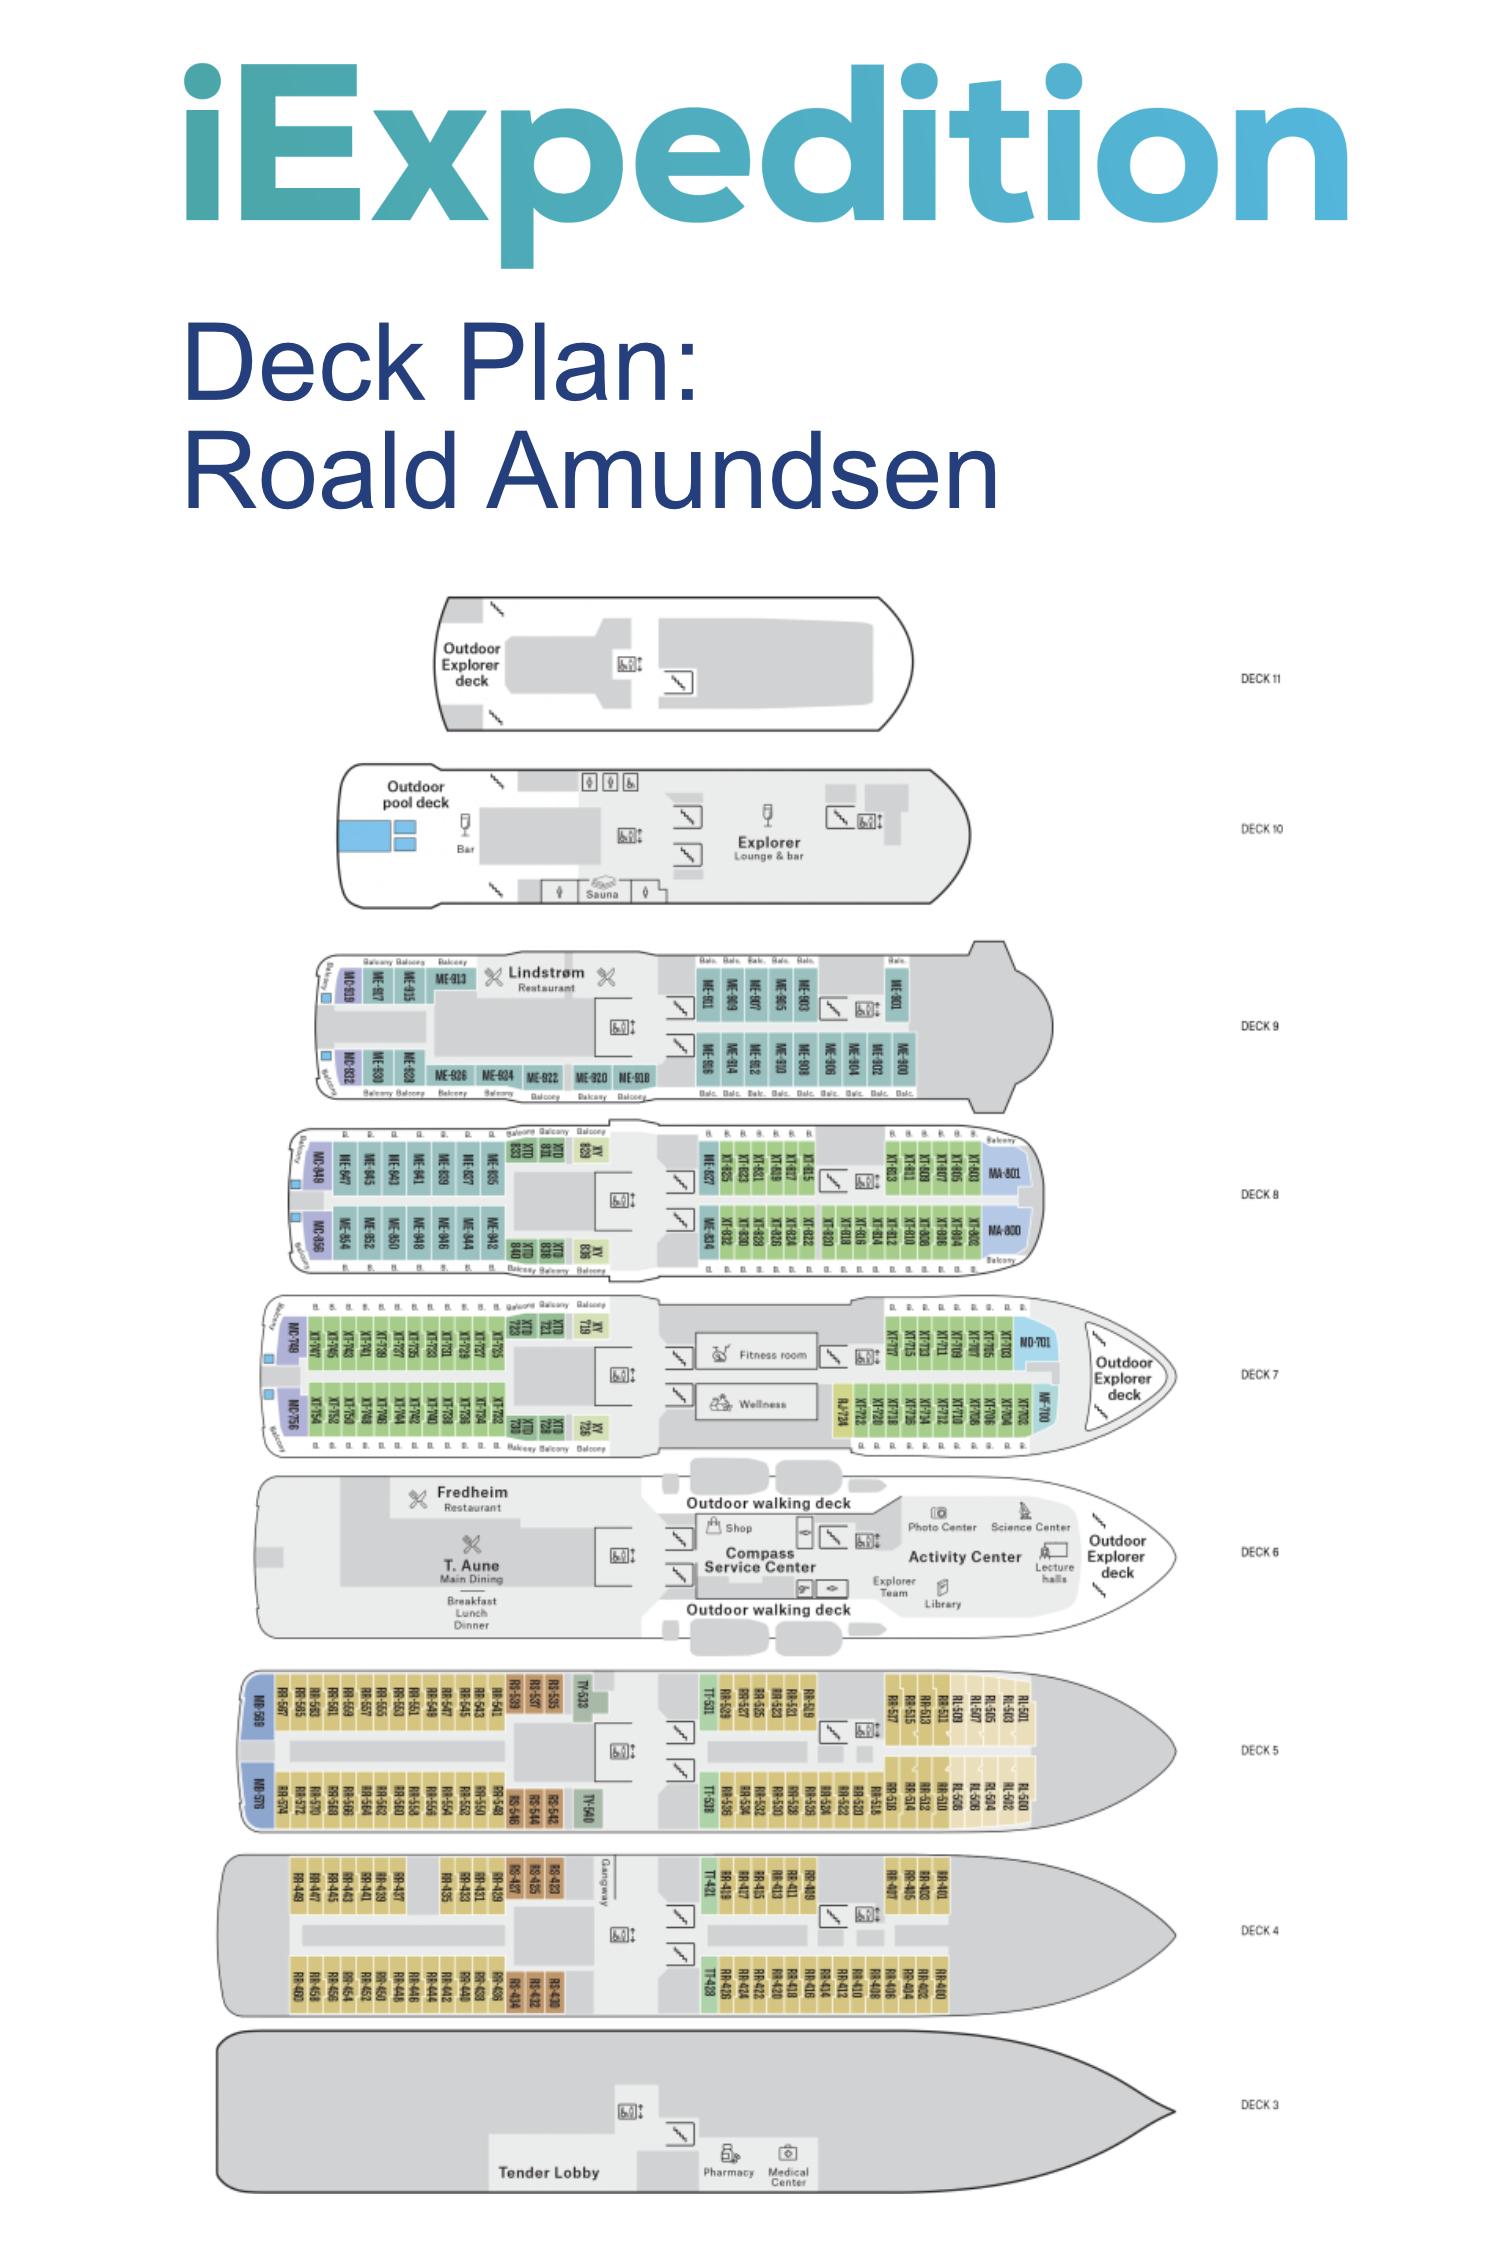 Roald amundsen deck plan